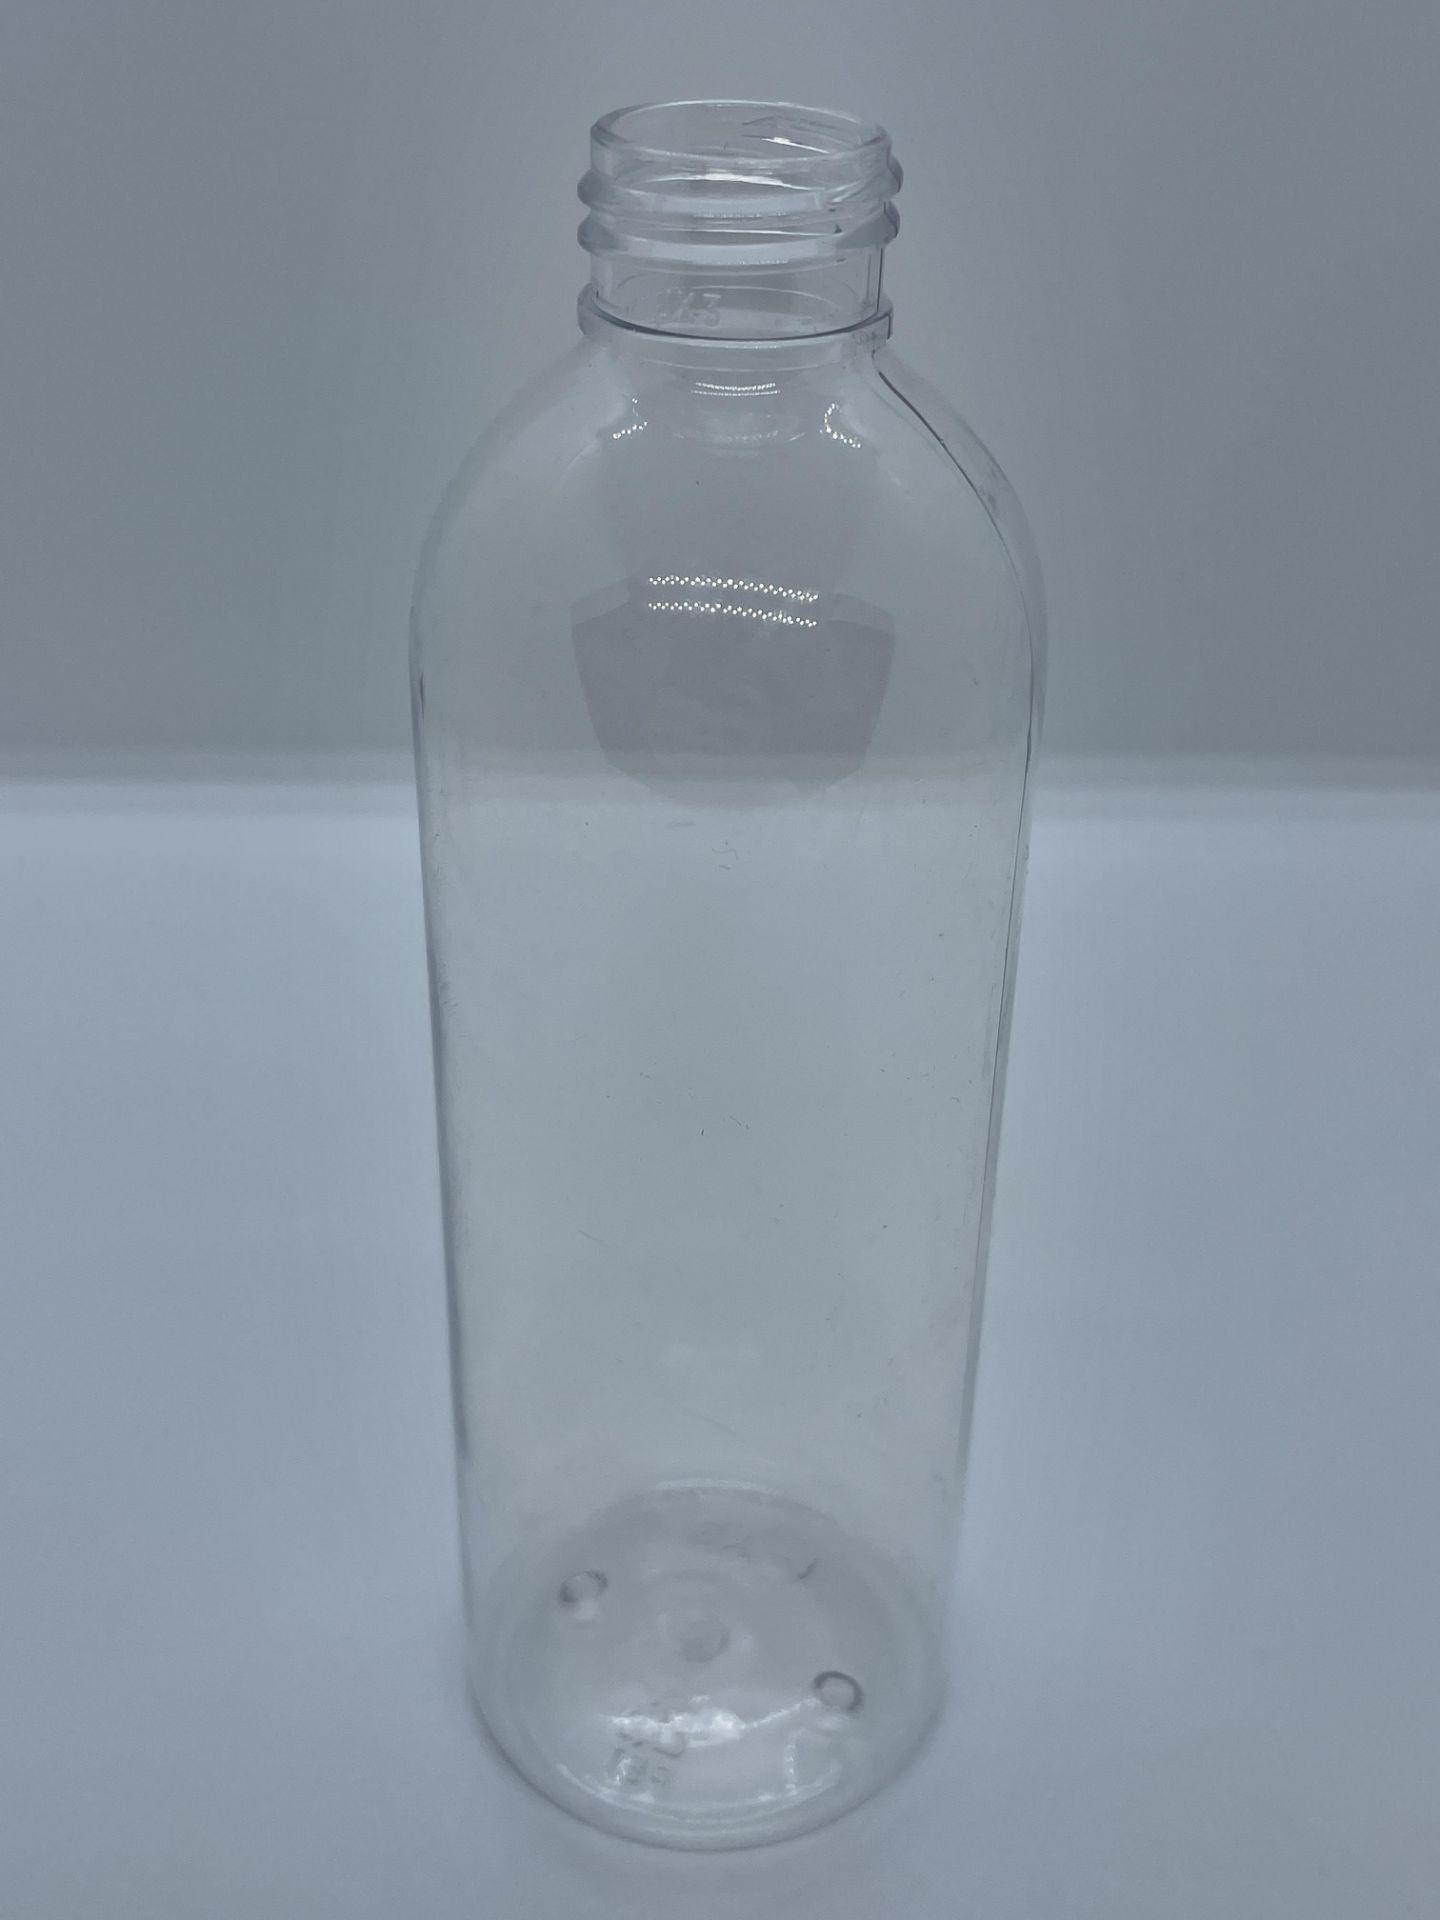 "75,000 - Clear Plastic Bullet 8 oz Empty Bottles, 24-410 Threading Neck, 6.25"" Tall, 2"" Diameter - Image 3 of 5"